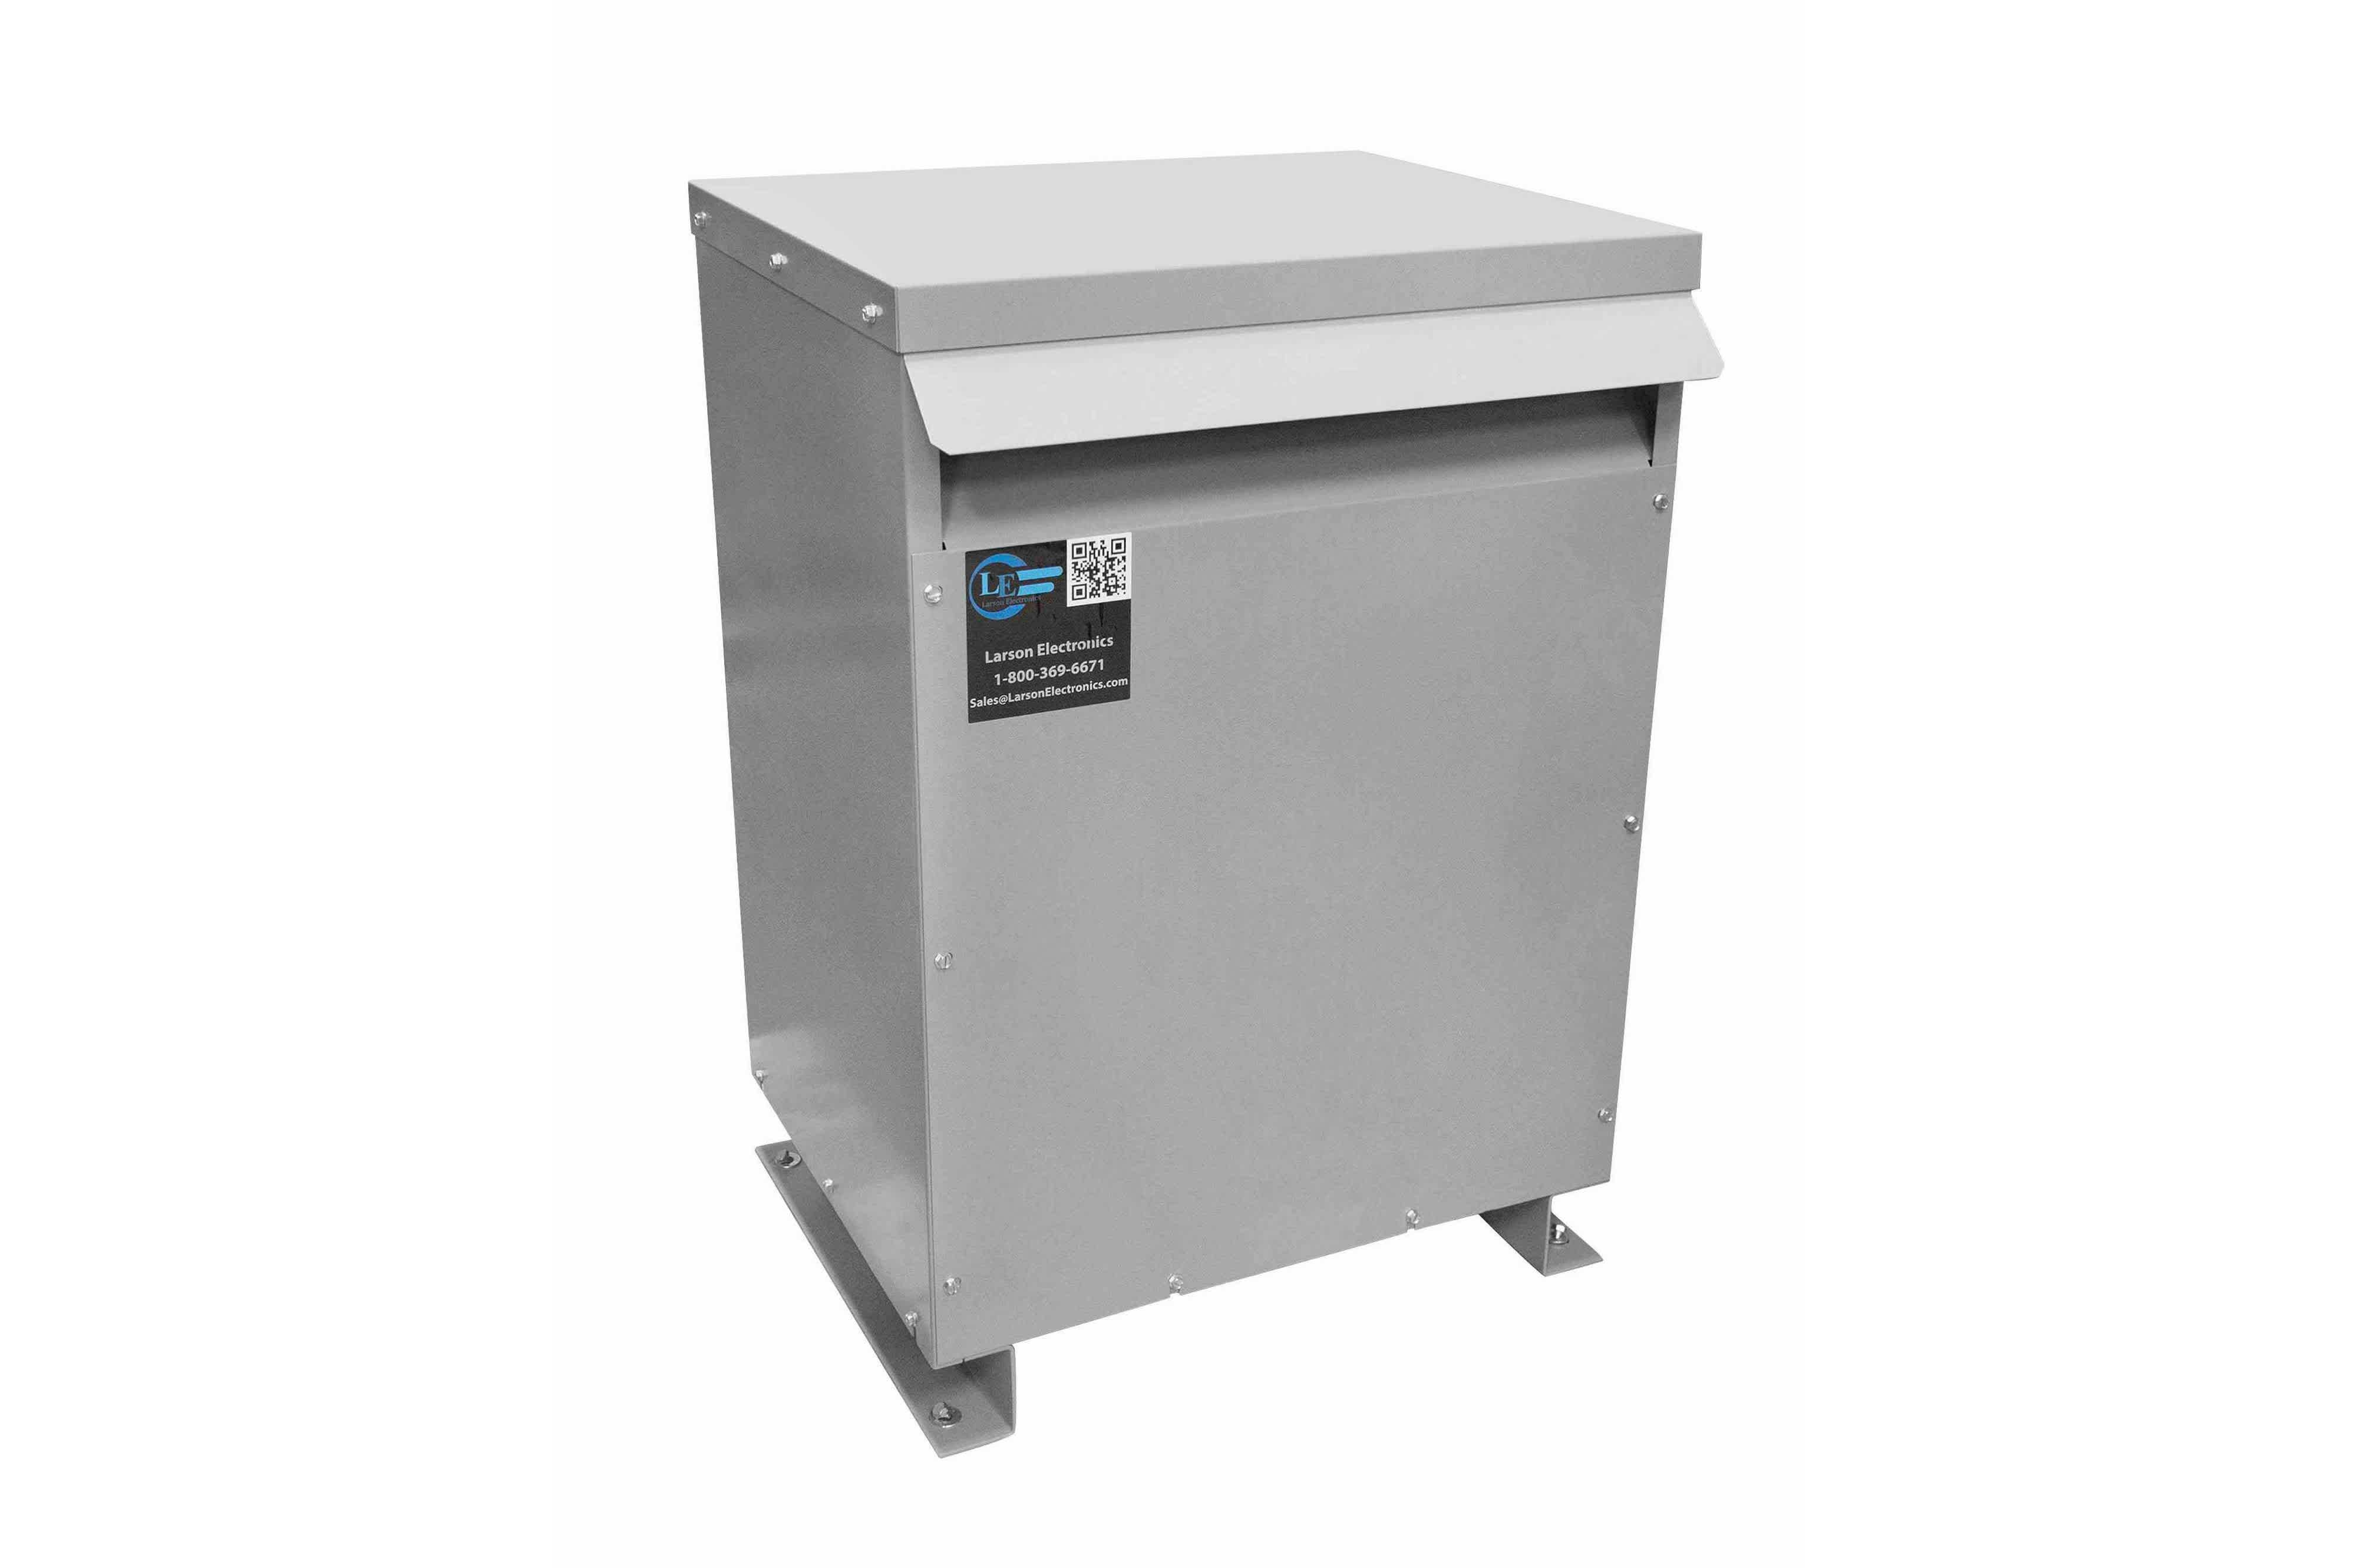 800 kVA 3PH Isolation Transformer, 480V Wye Primary, 240V/120 Delta Secondary, N3R, Ventilated, 60 Hz